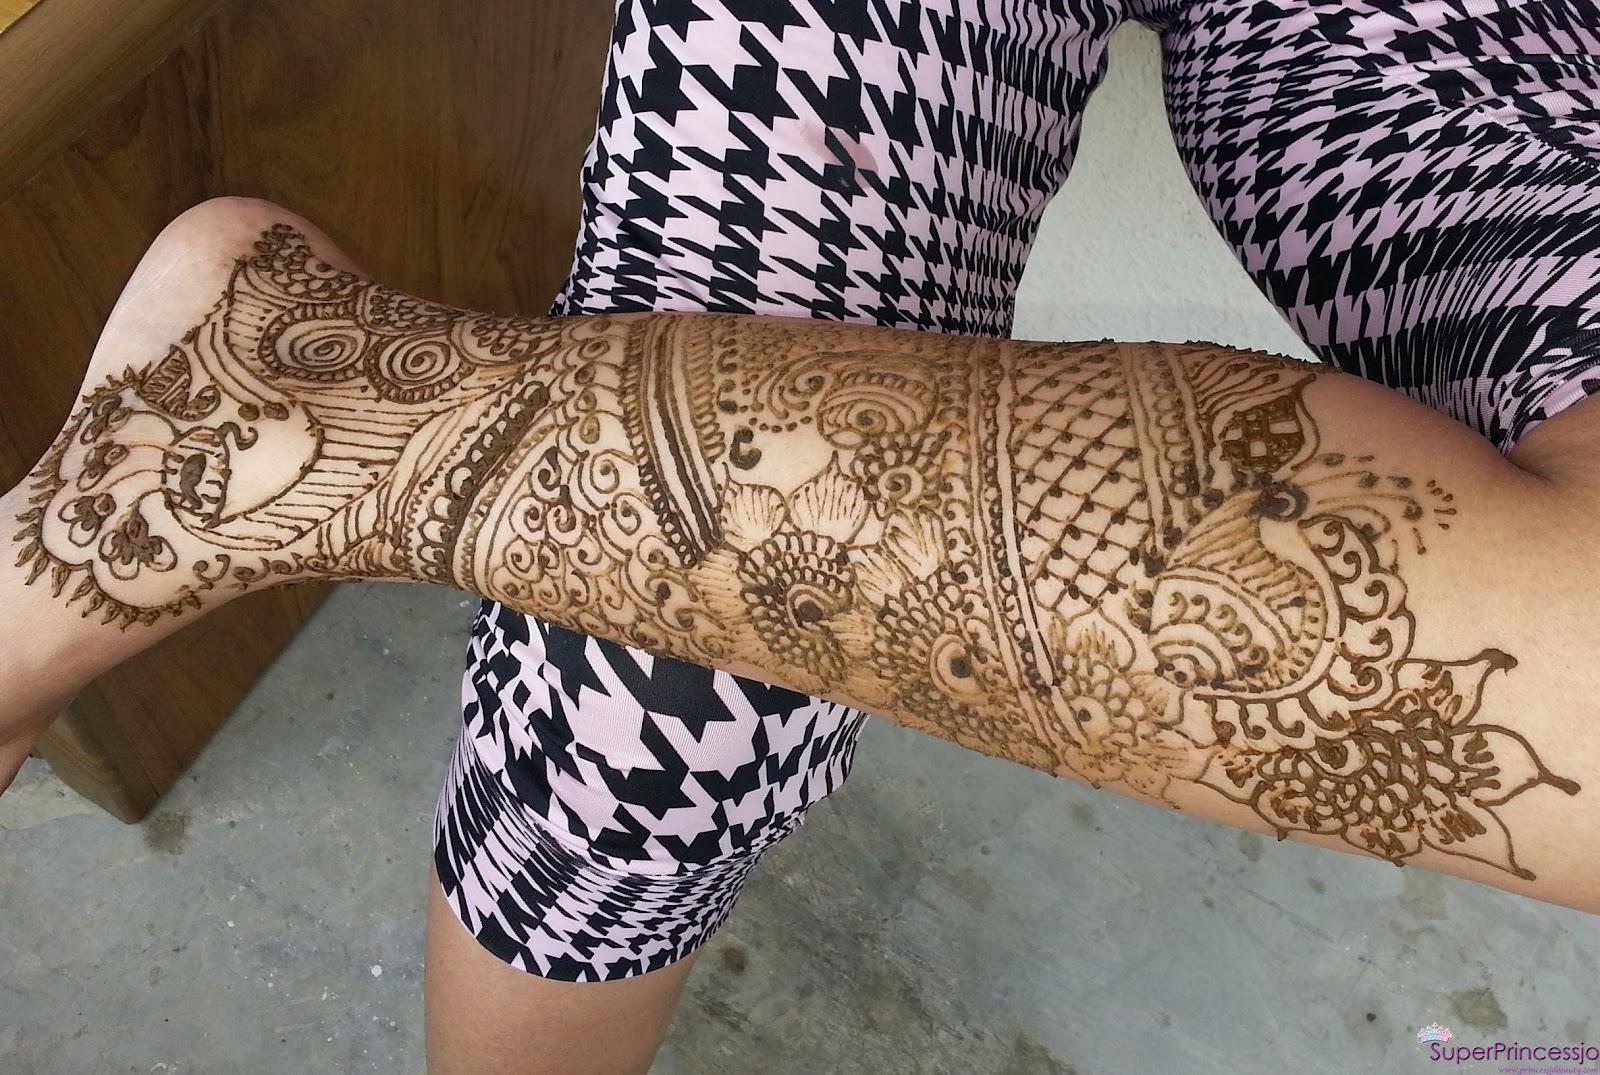 Superprincessjo Henna Mehendi Designs Full Feet Henna Tattoo Art